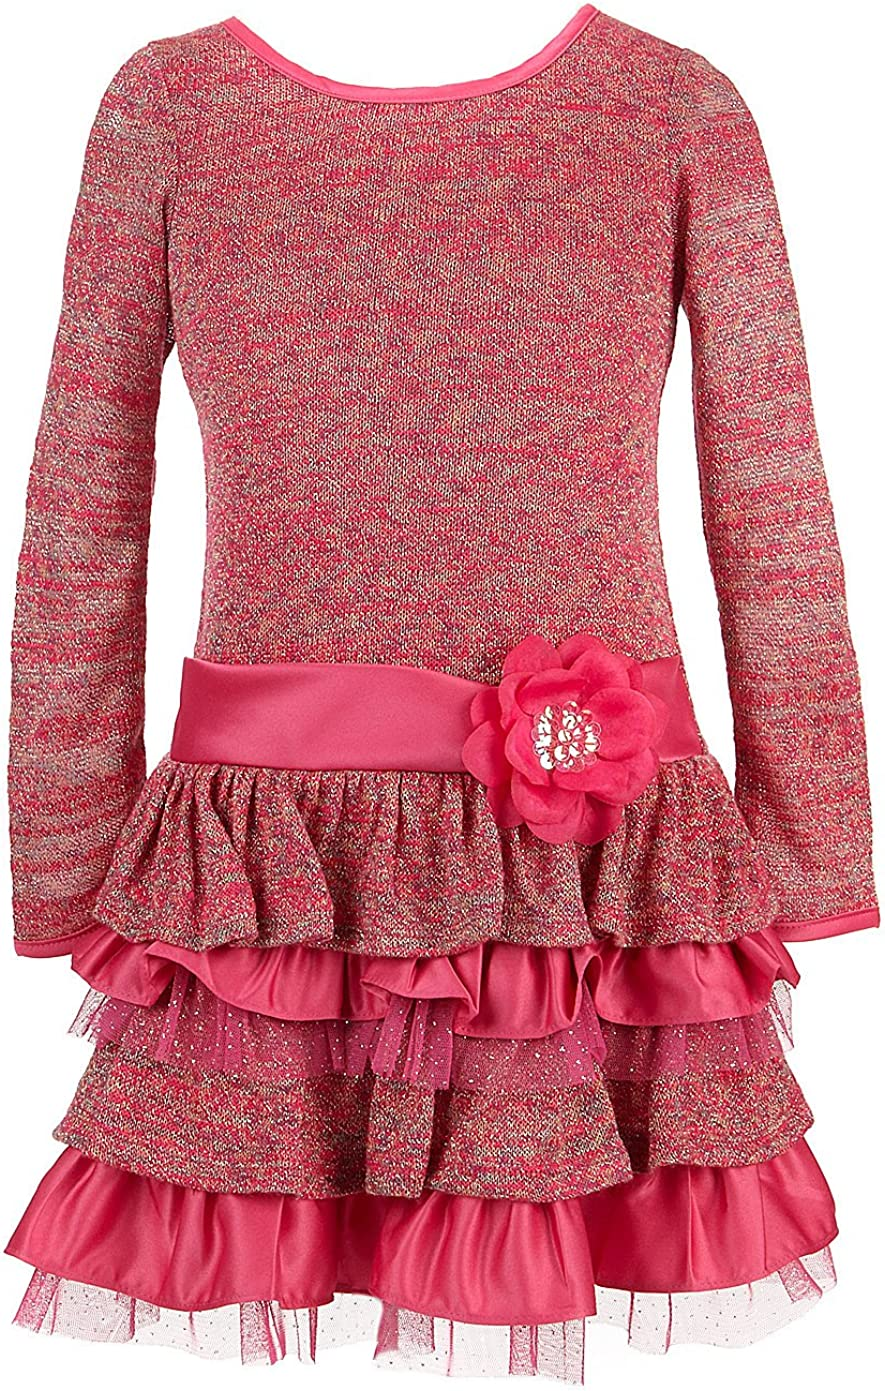 Bonnie Jean Girls Dresses Fuchsia Sparkle Knit Tiered Dress 4